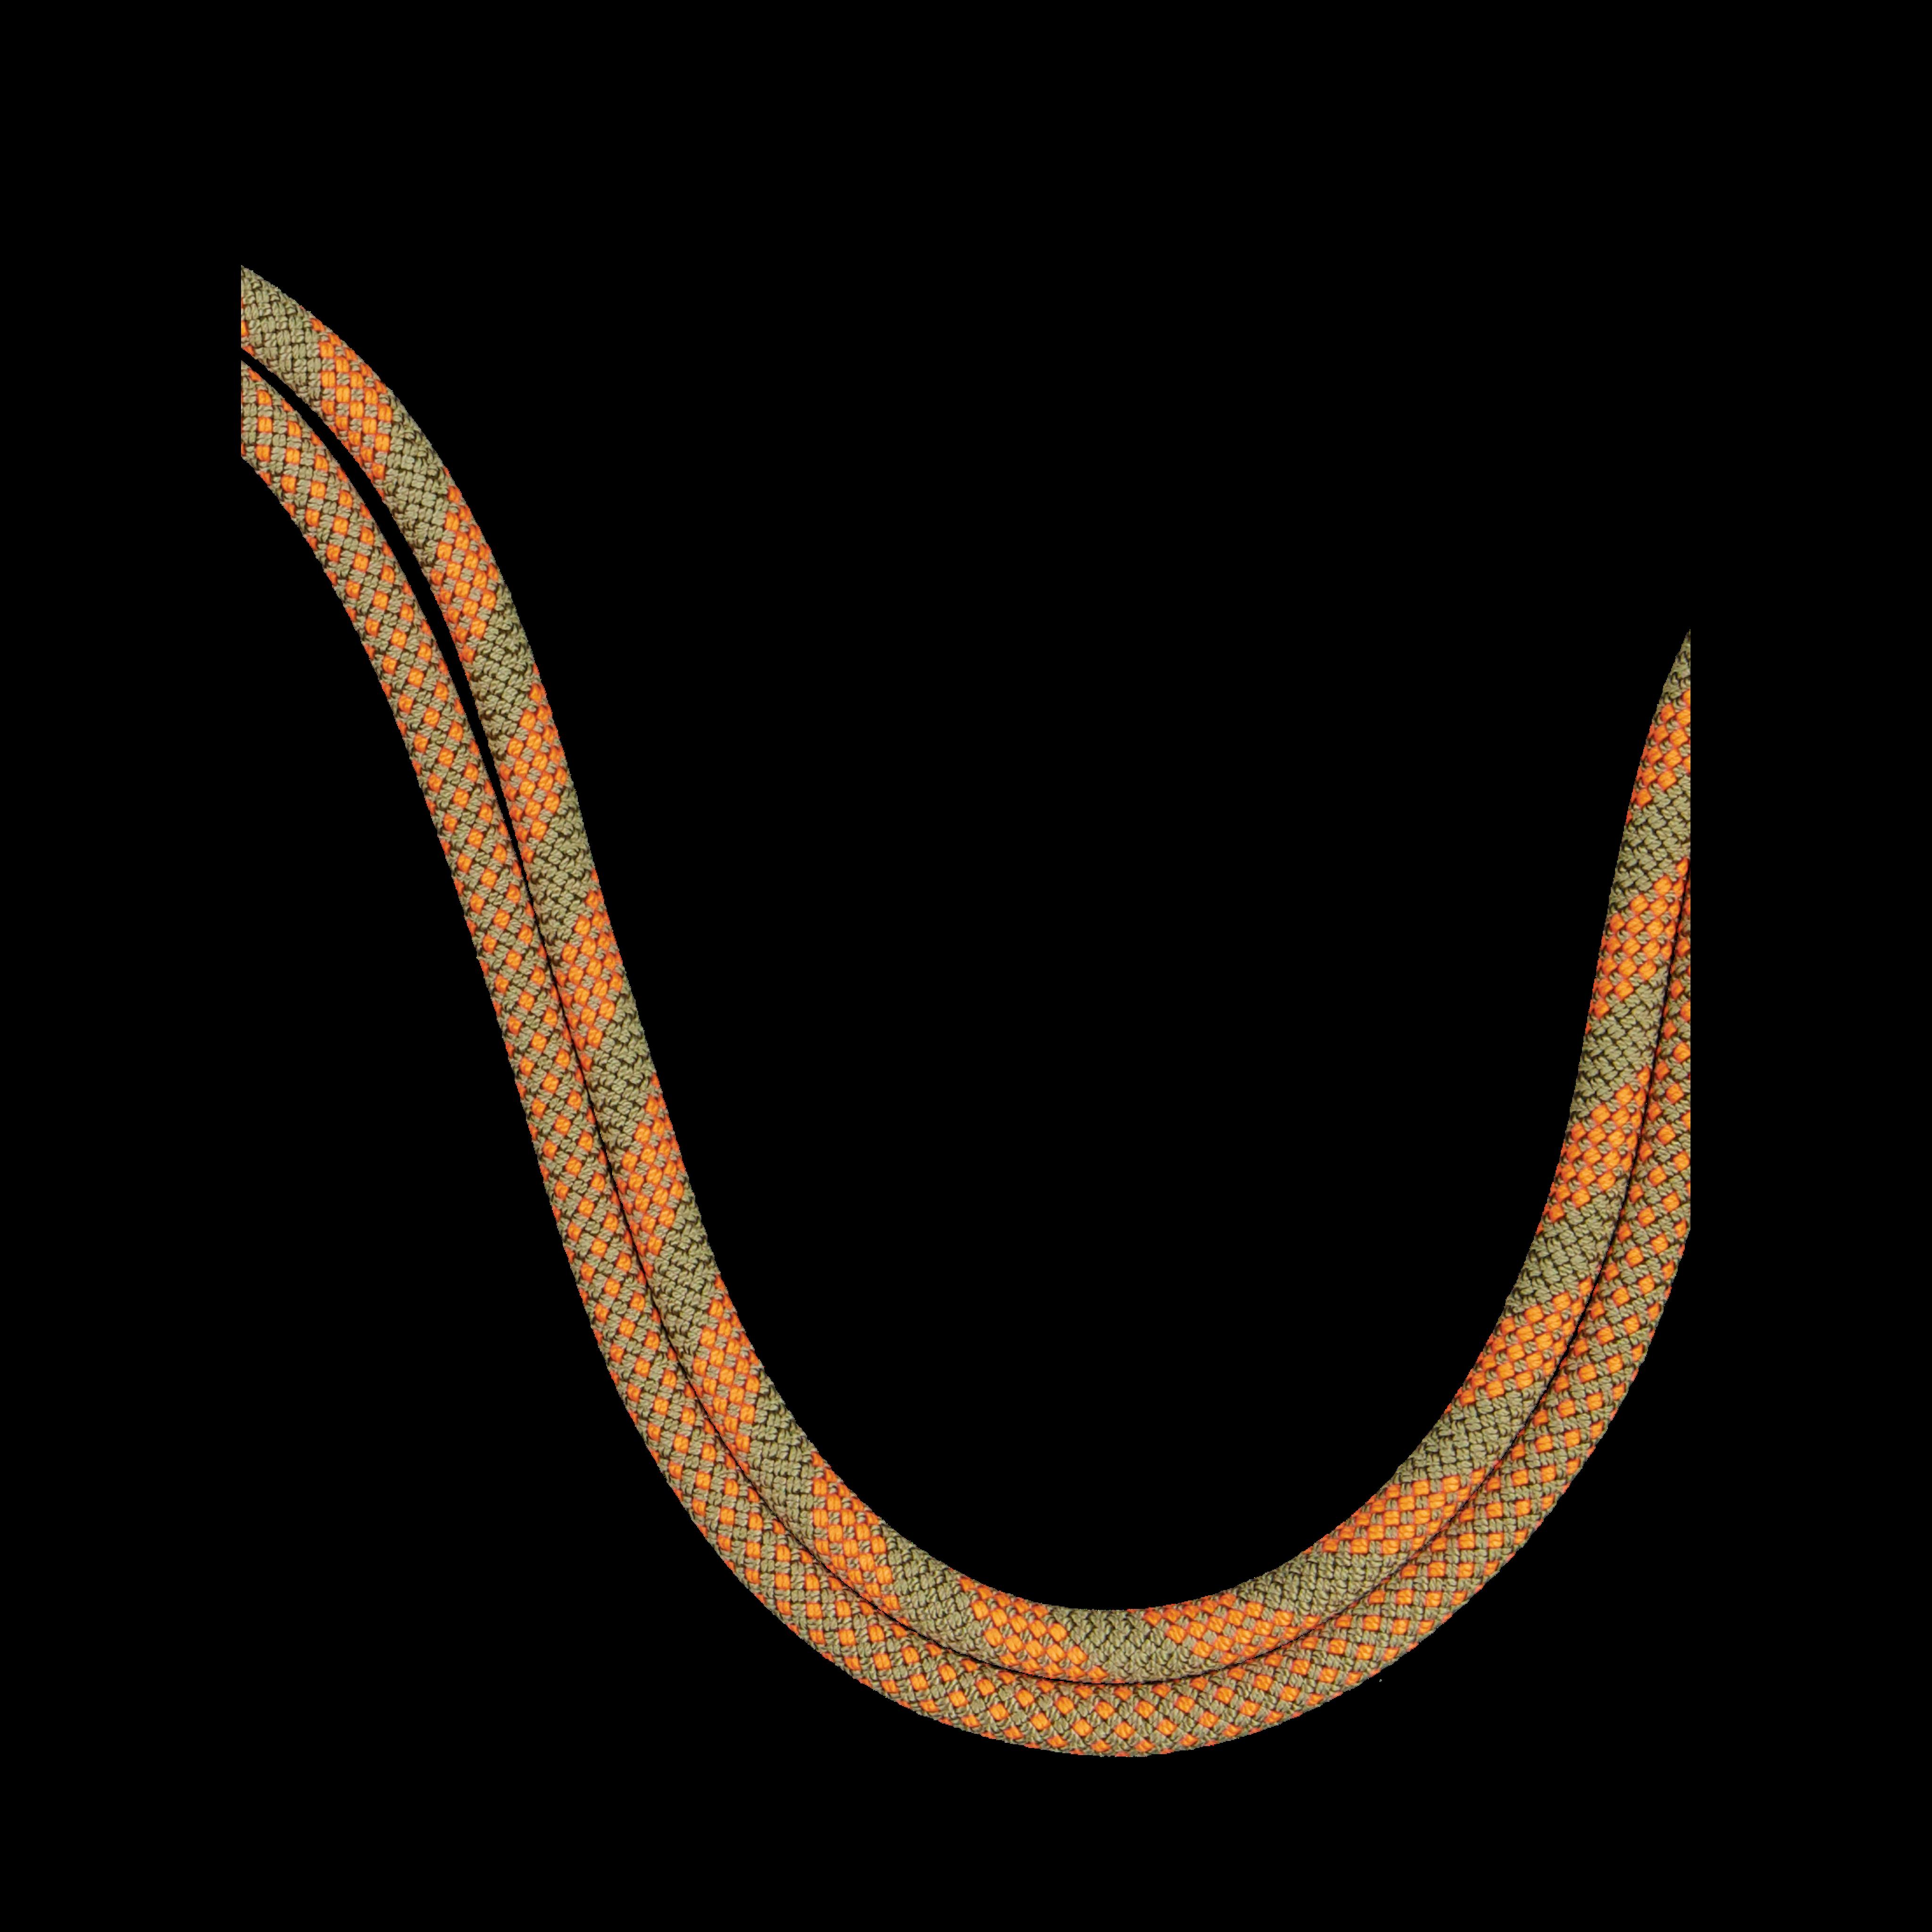 9.5 Crag Dry Rope image